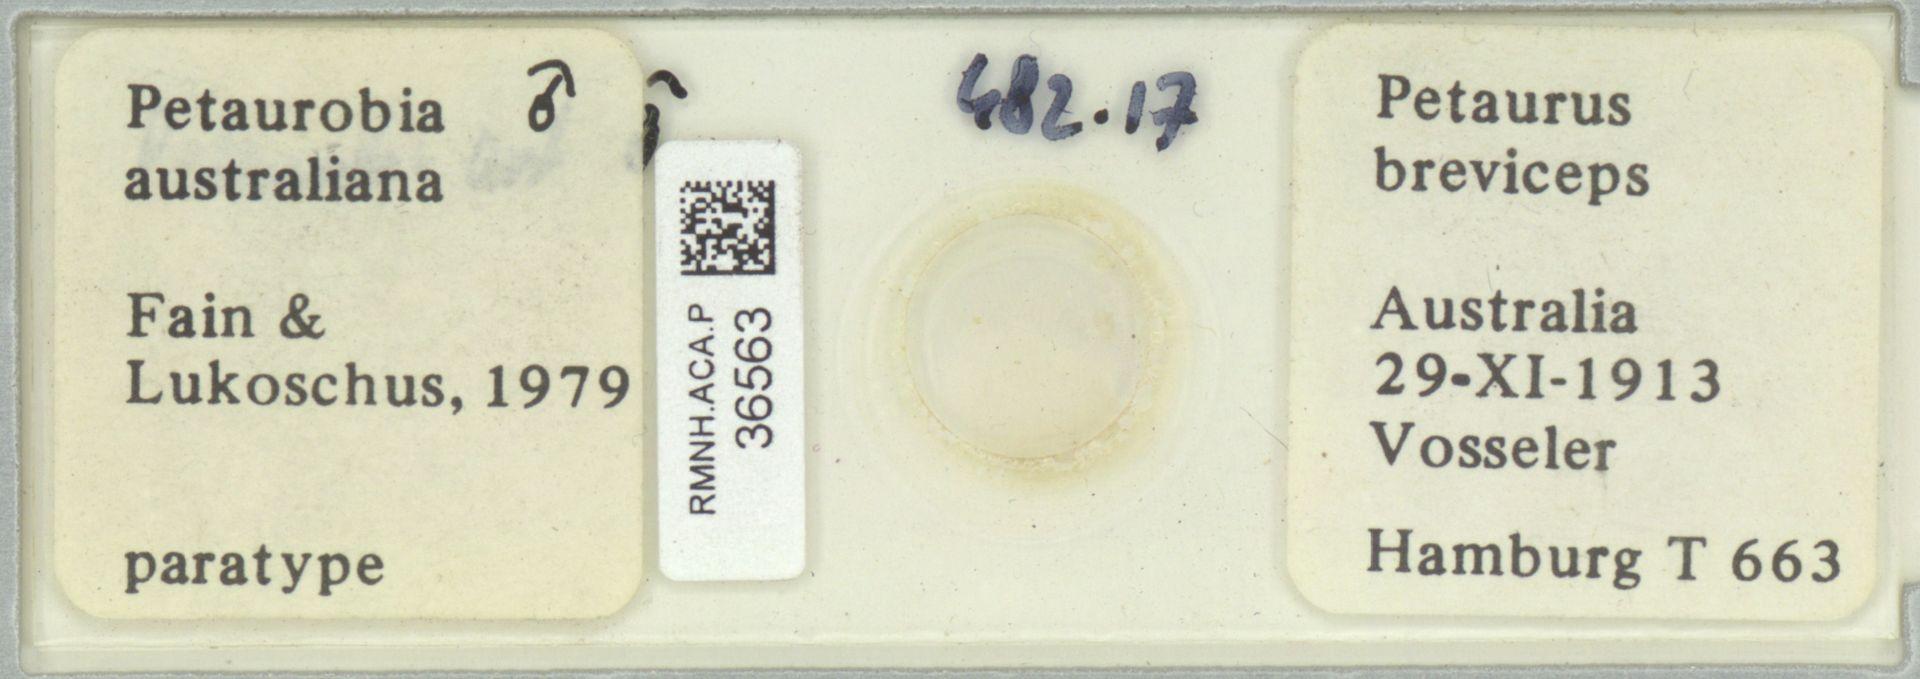 RMNH.ACA.P.36563 | Petaurobia australiana Fain & Lukoschus, 1979